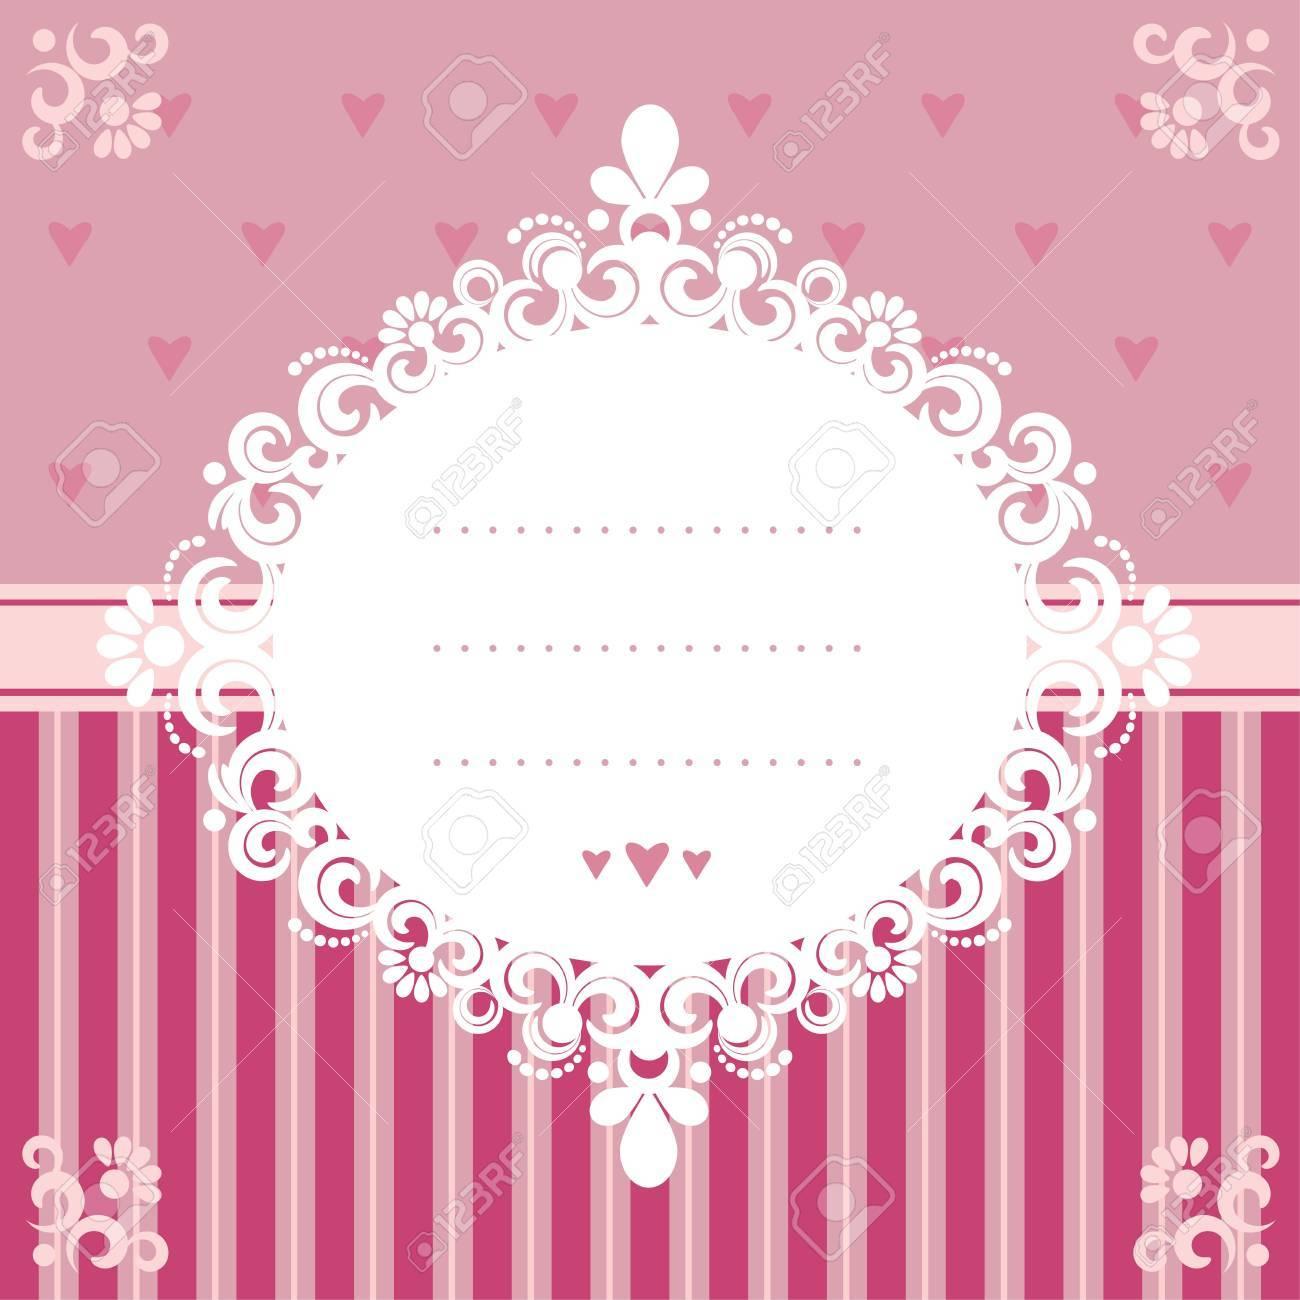 Design Invitation Card In Pink Tones Eps 10